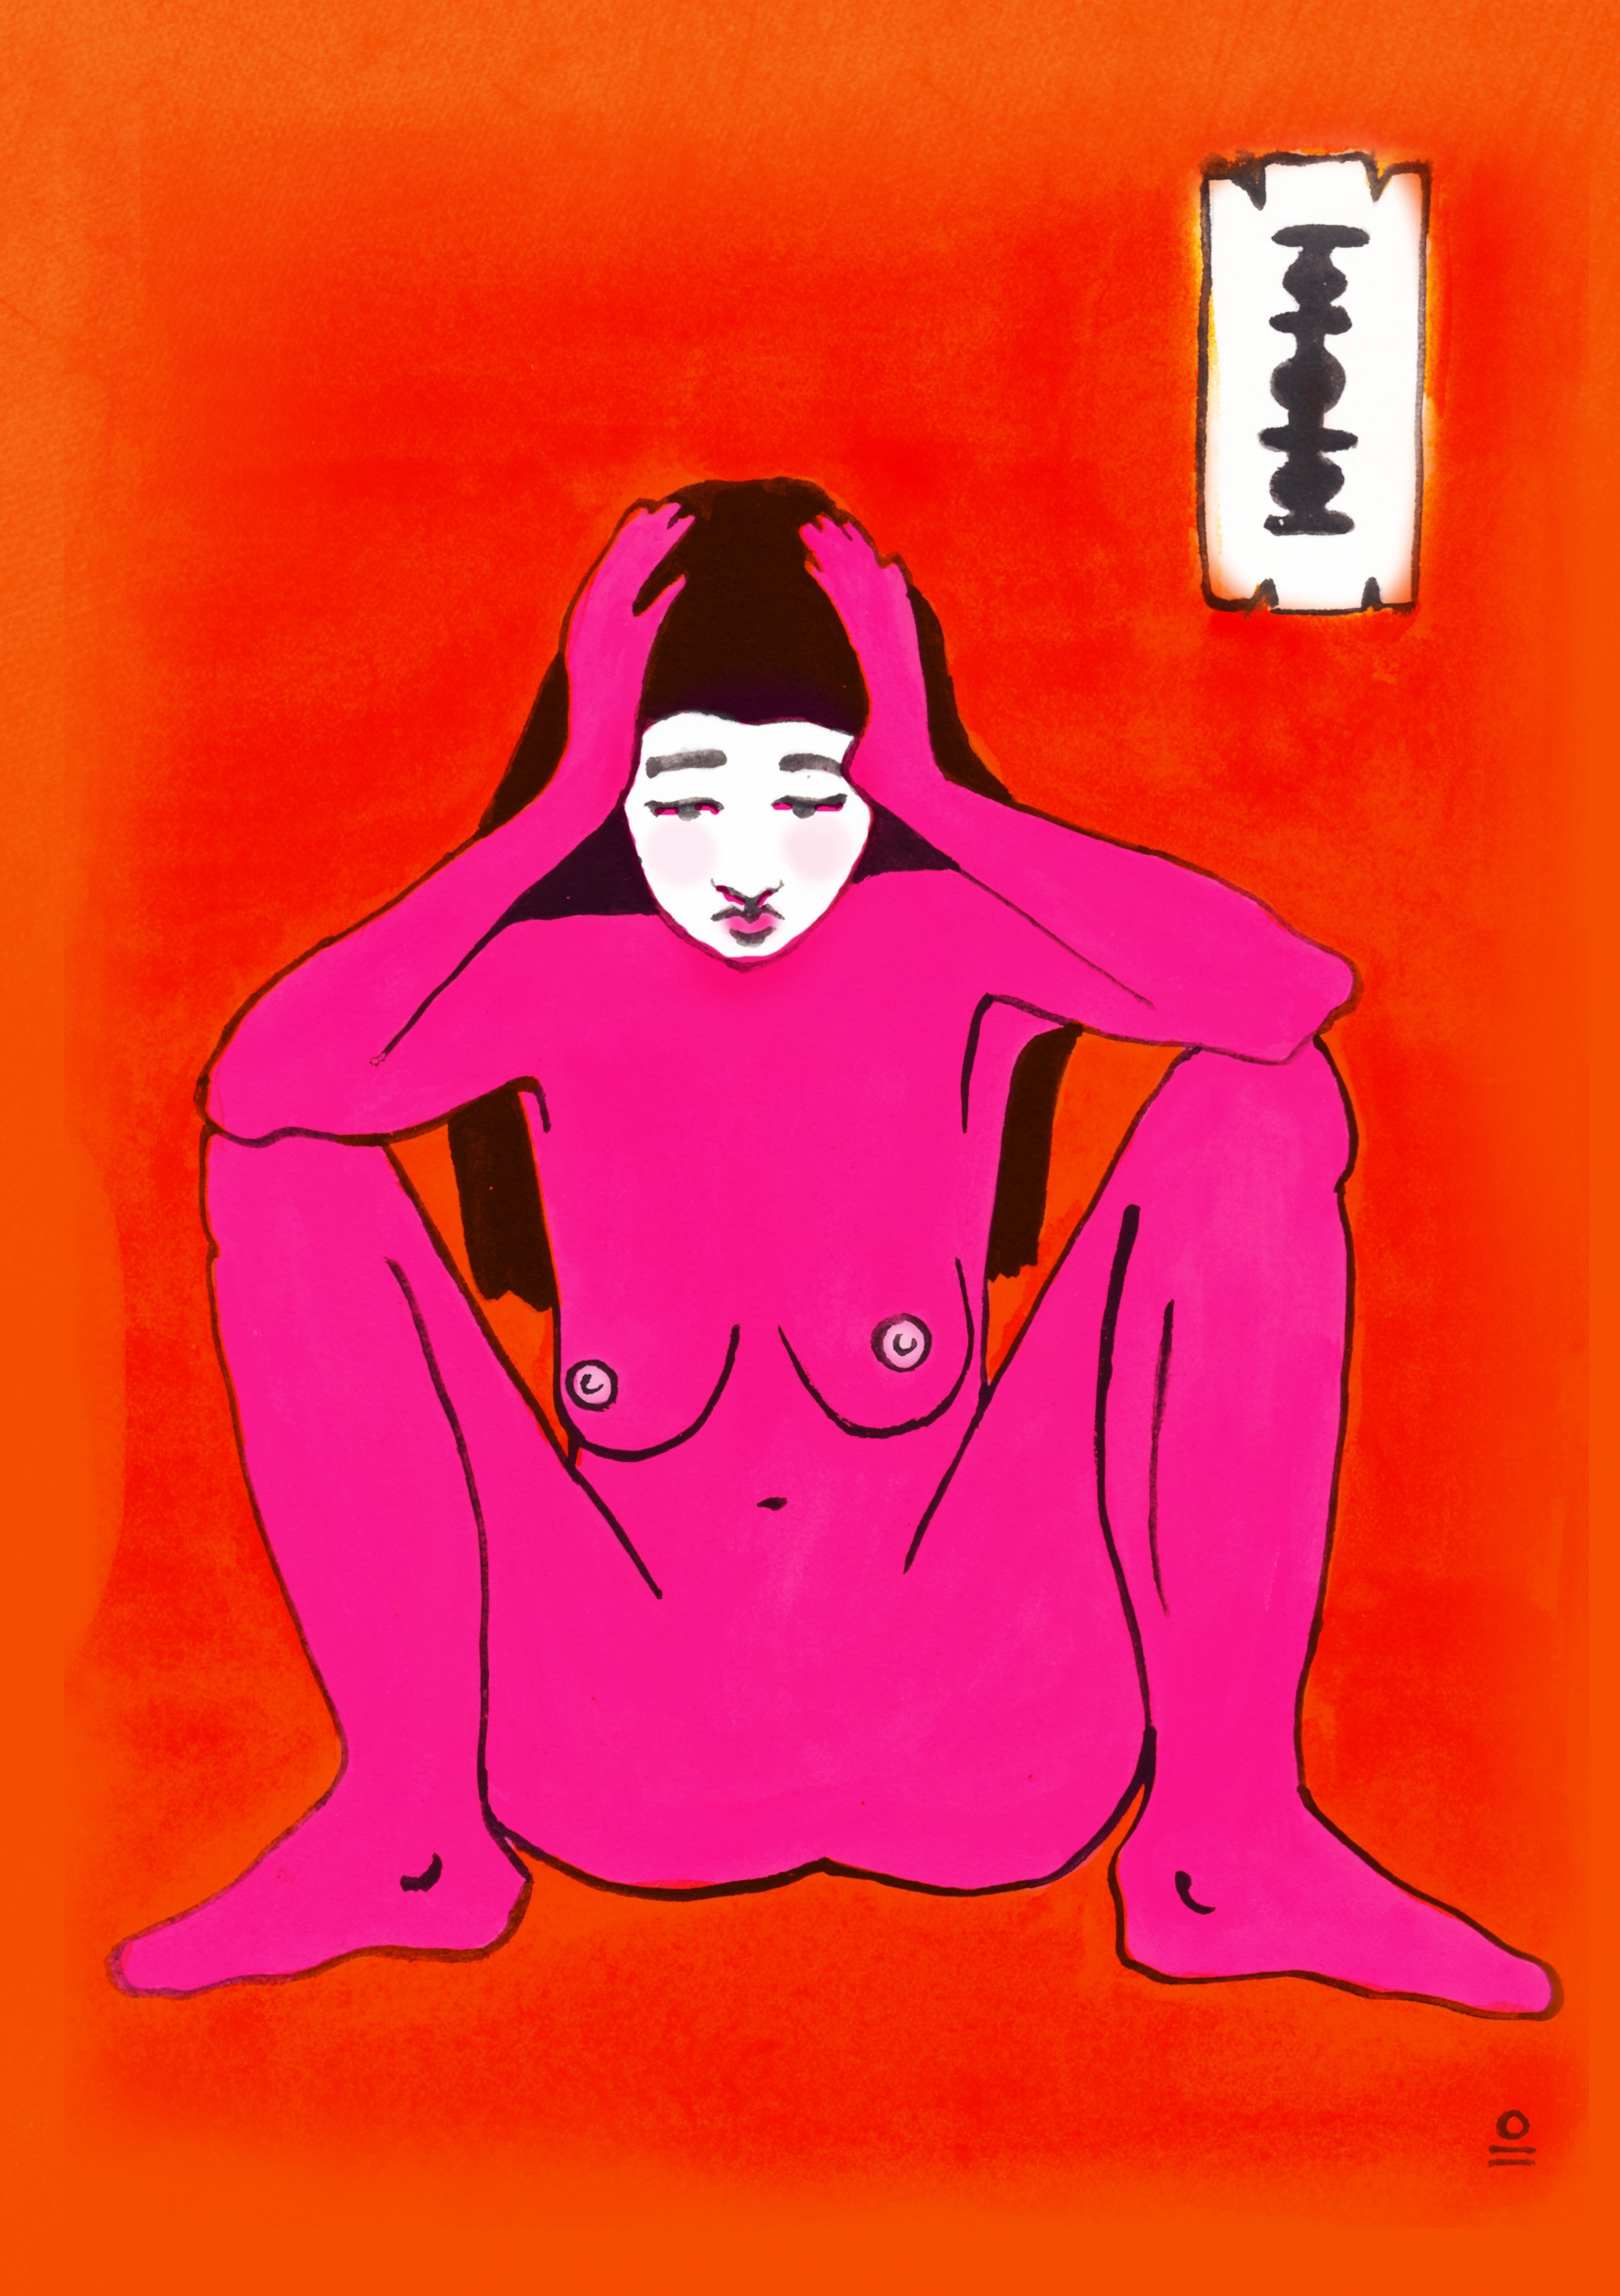 FEMALE GENITAL MUTILATION inspi - opographics | ello